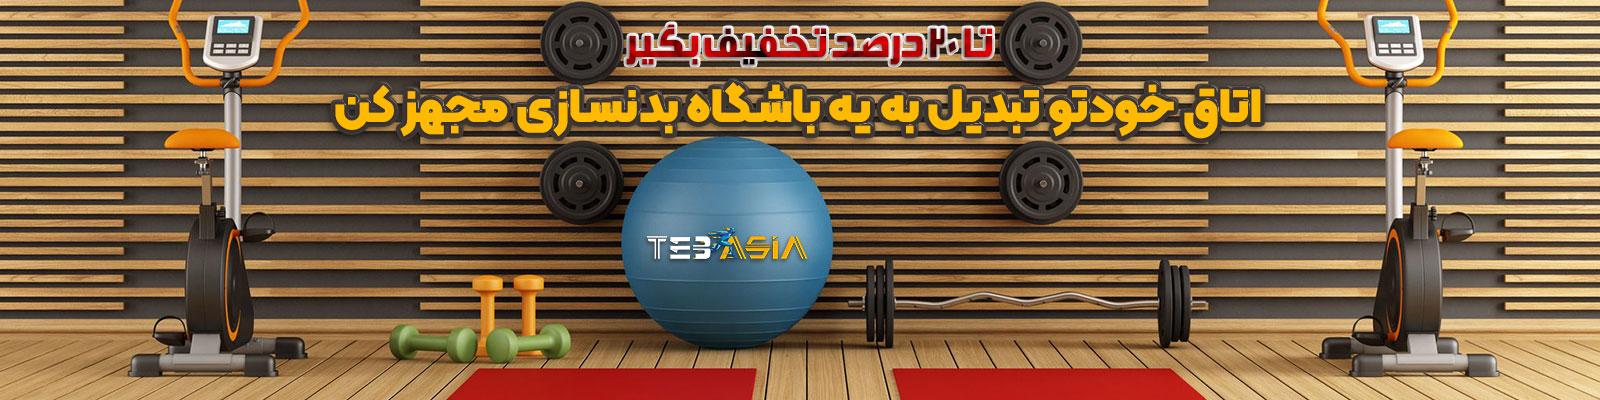 tebasia-off-GYM-room